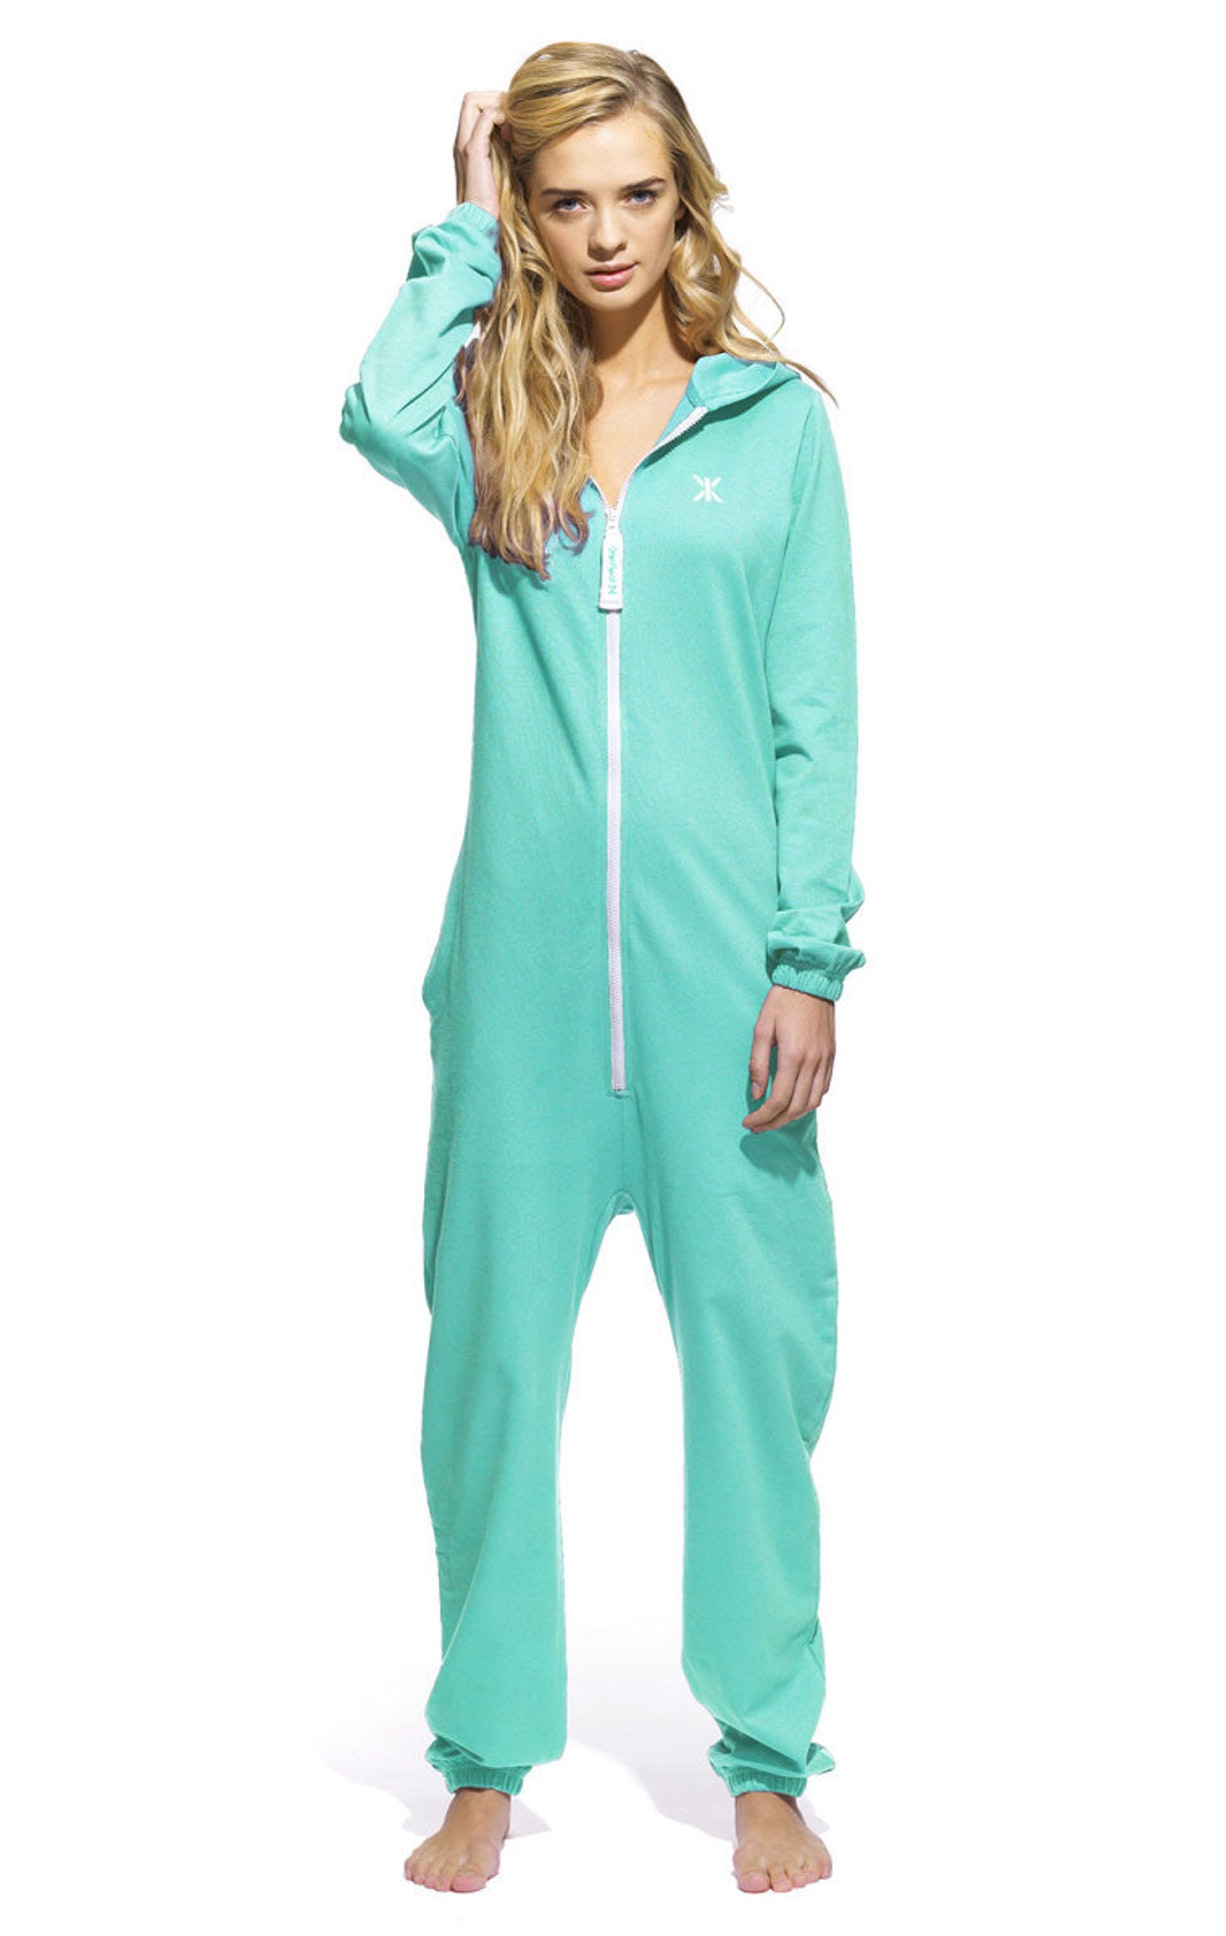 onepiece onesie aruba blau unisex jumpsuit. Black Bedroom Furniture Sets. Home Design Ideas